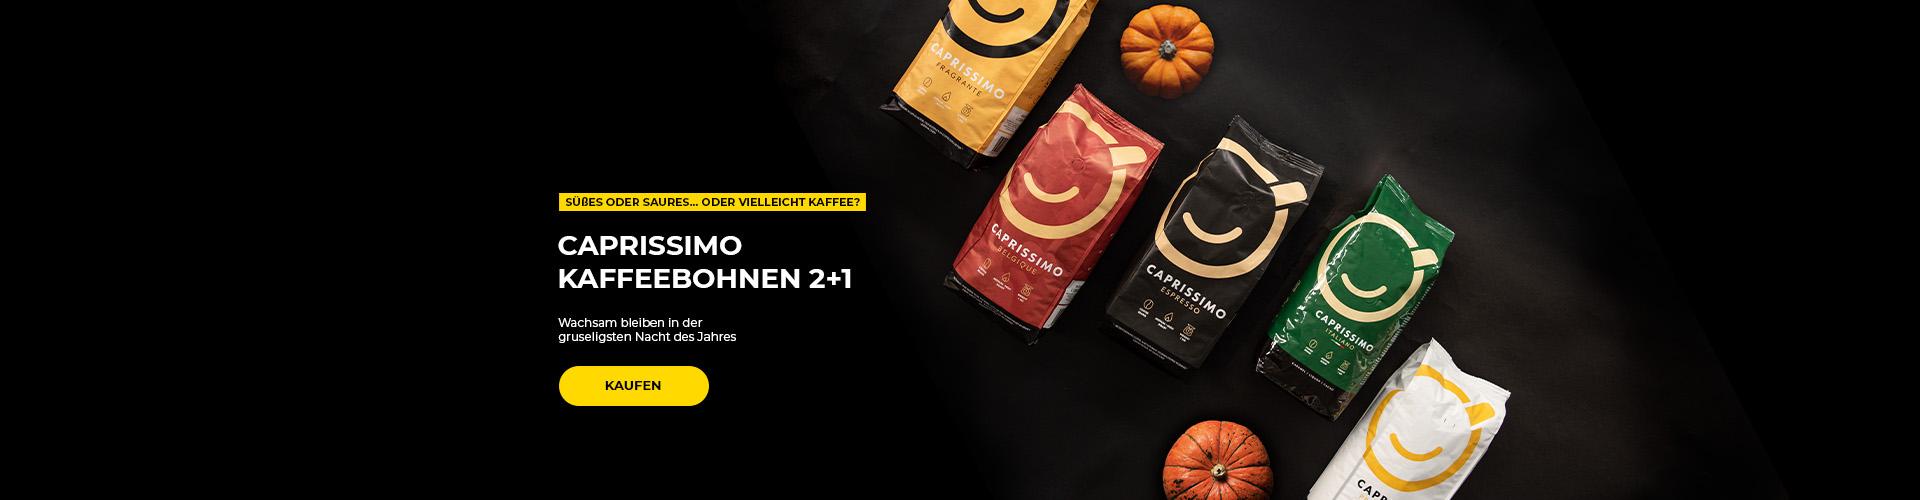 Caprissimo Kaffeebohnen 2+1